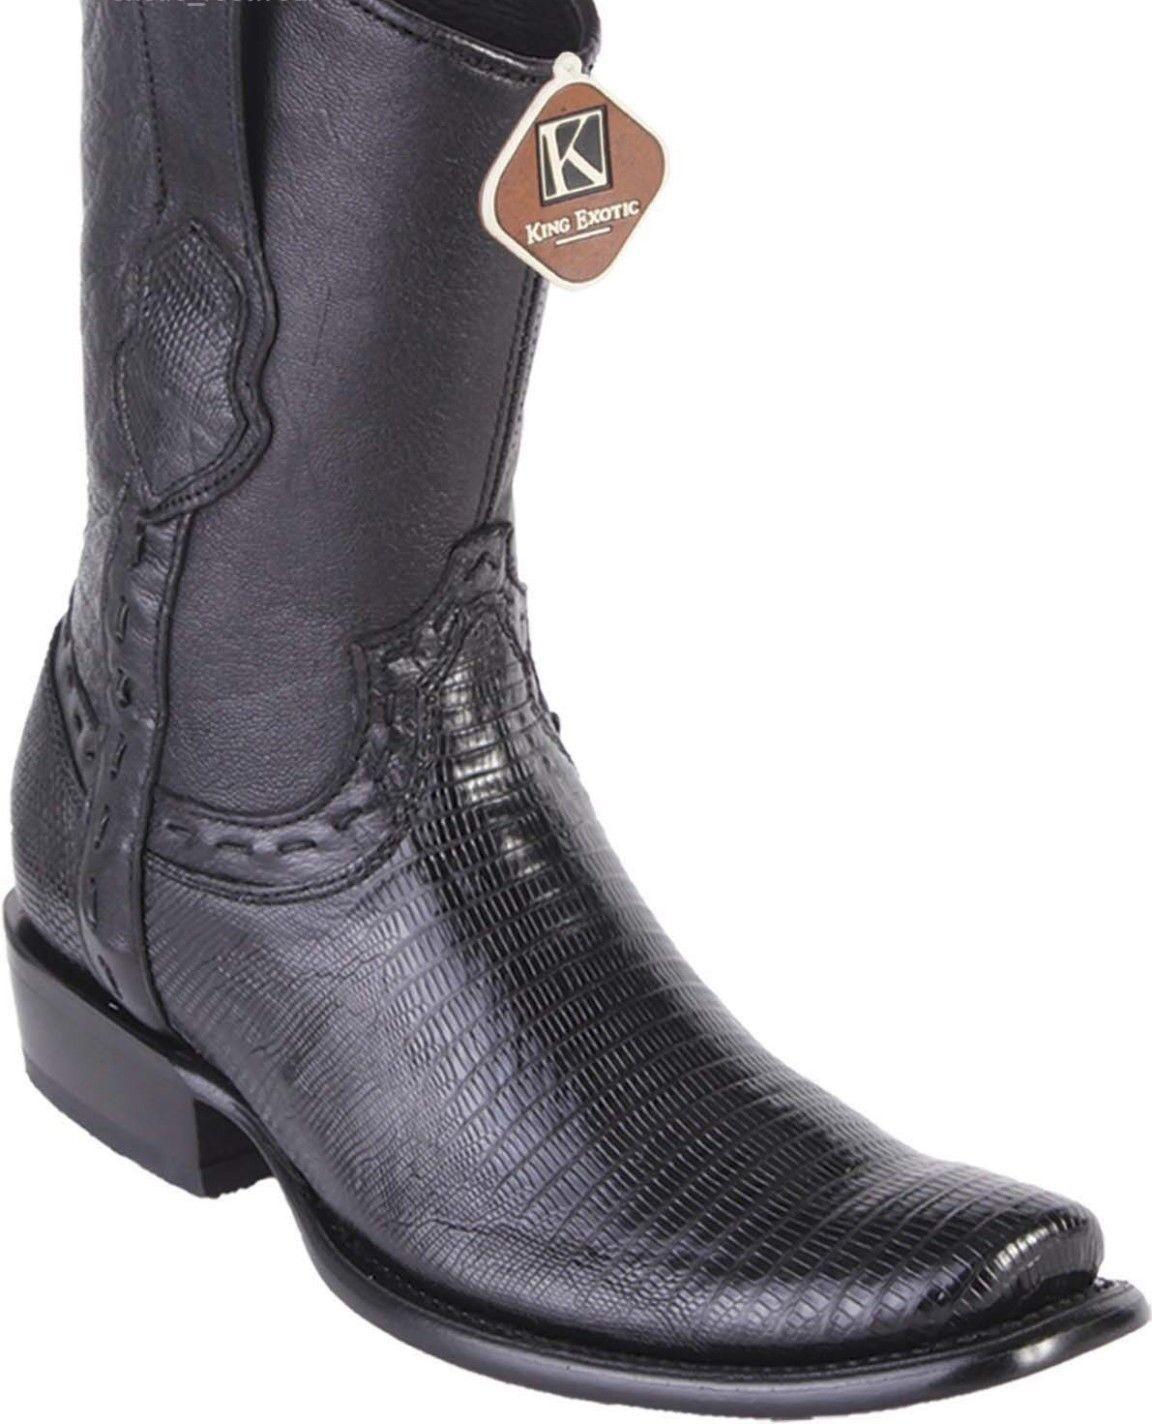 King Exotic BLACK TEJU LIZARD Western Boot Side Zipper Mid Calf EE+